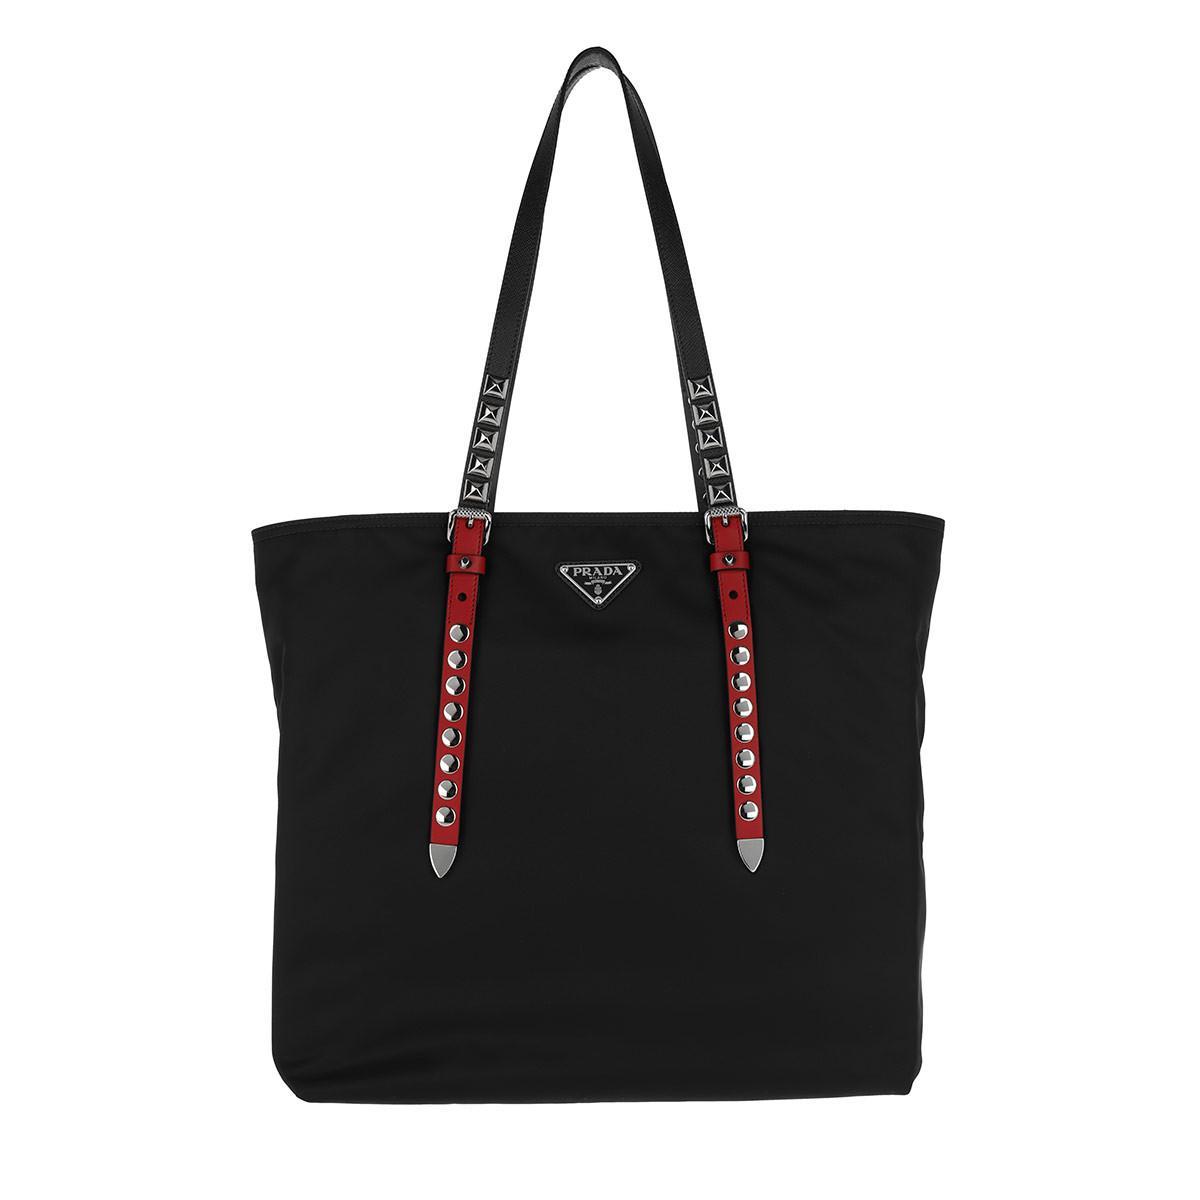 5a559a700d77 ... canada prada new vela tote nylon black red in black lyst 9443b 20047